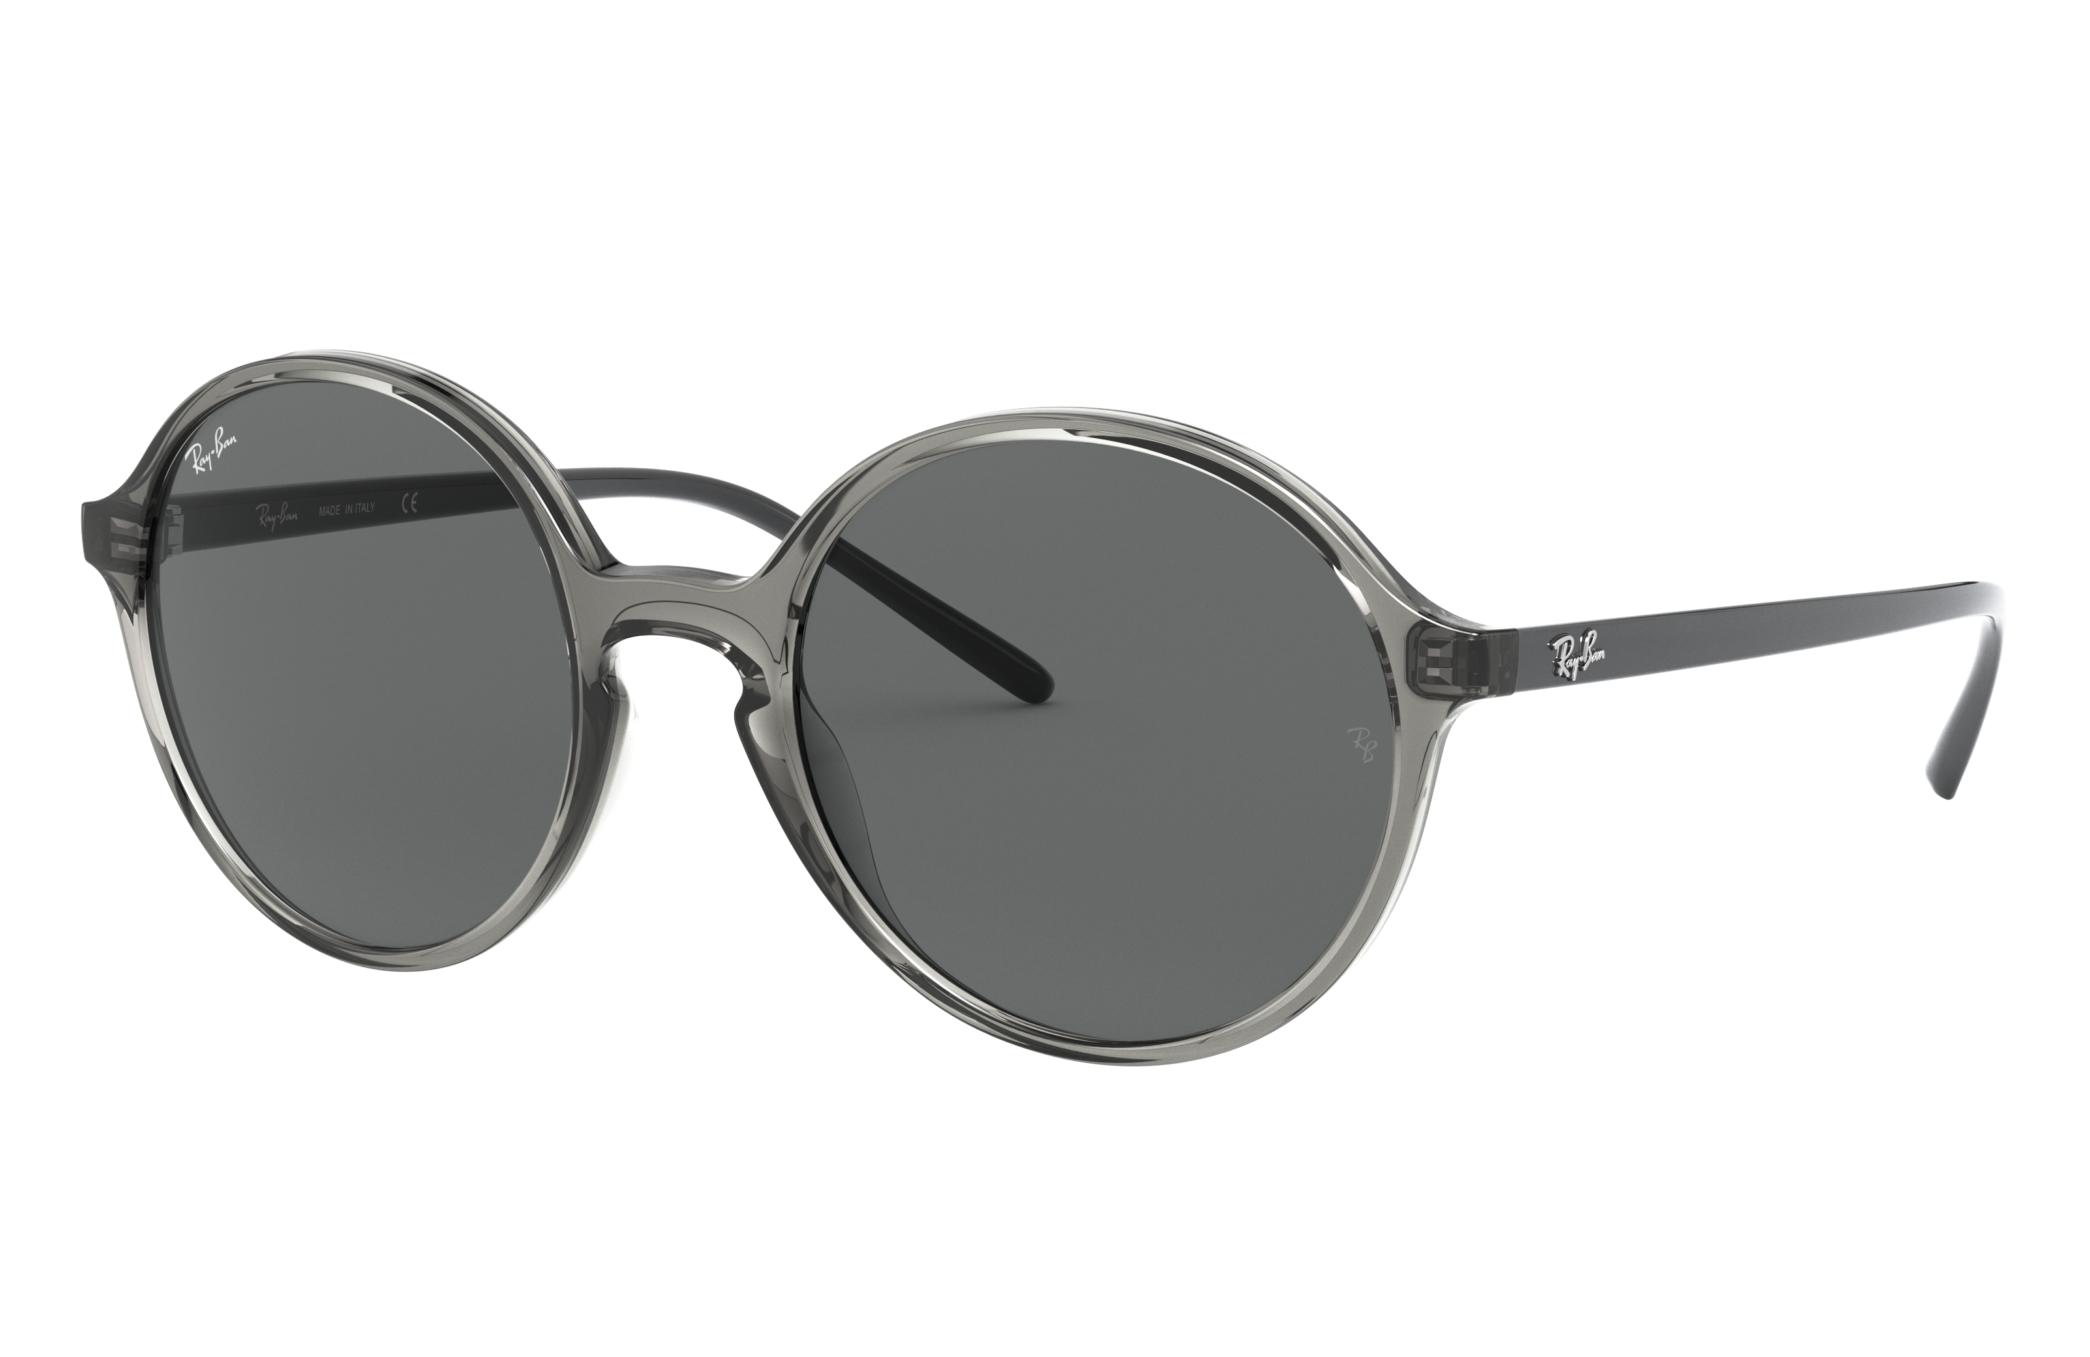 Ray-Ban Rb4304 Grey, Gray Lenses - RB4304